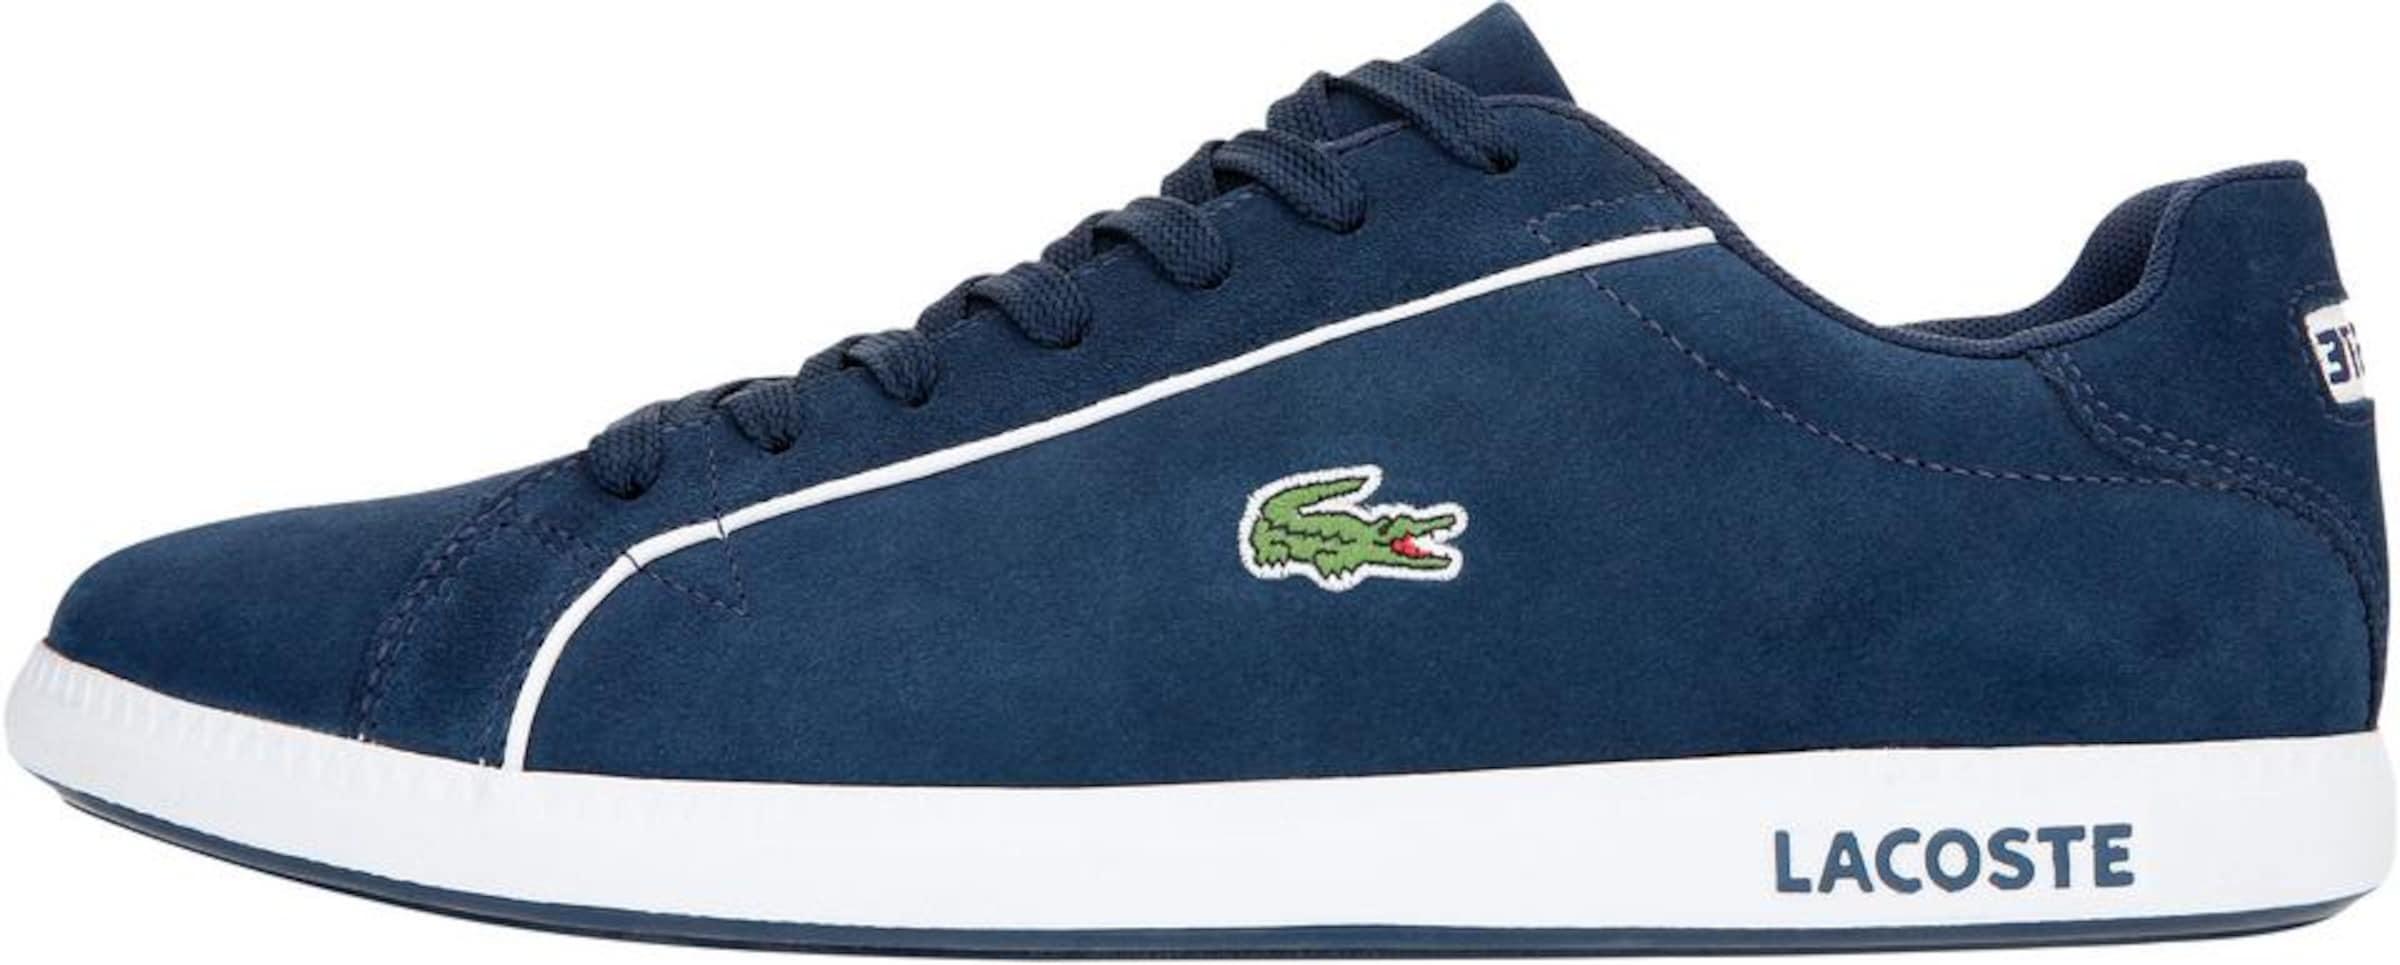 Lacoste In 'graduate' NavyHellgrün Weiß Sneaker bf6gy7